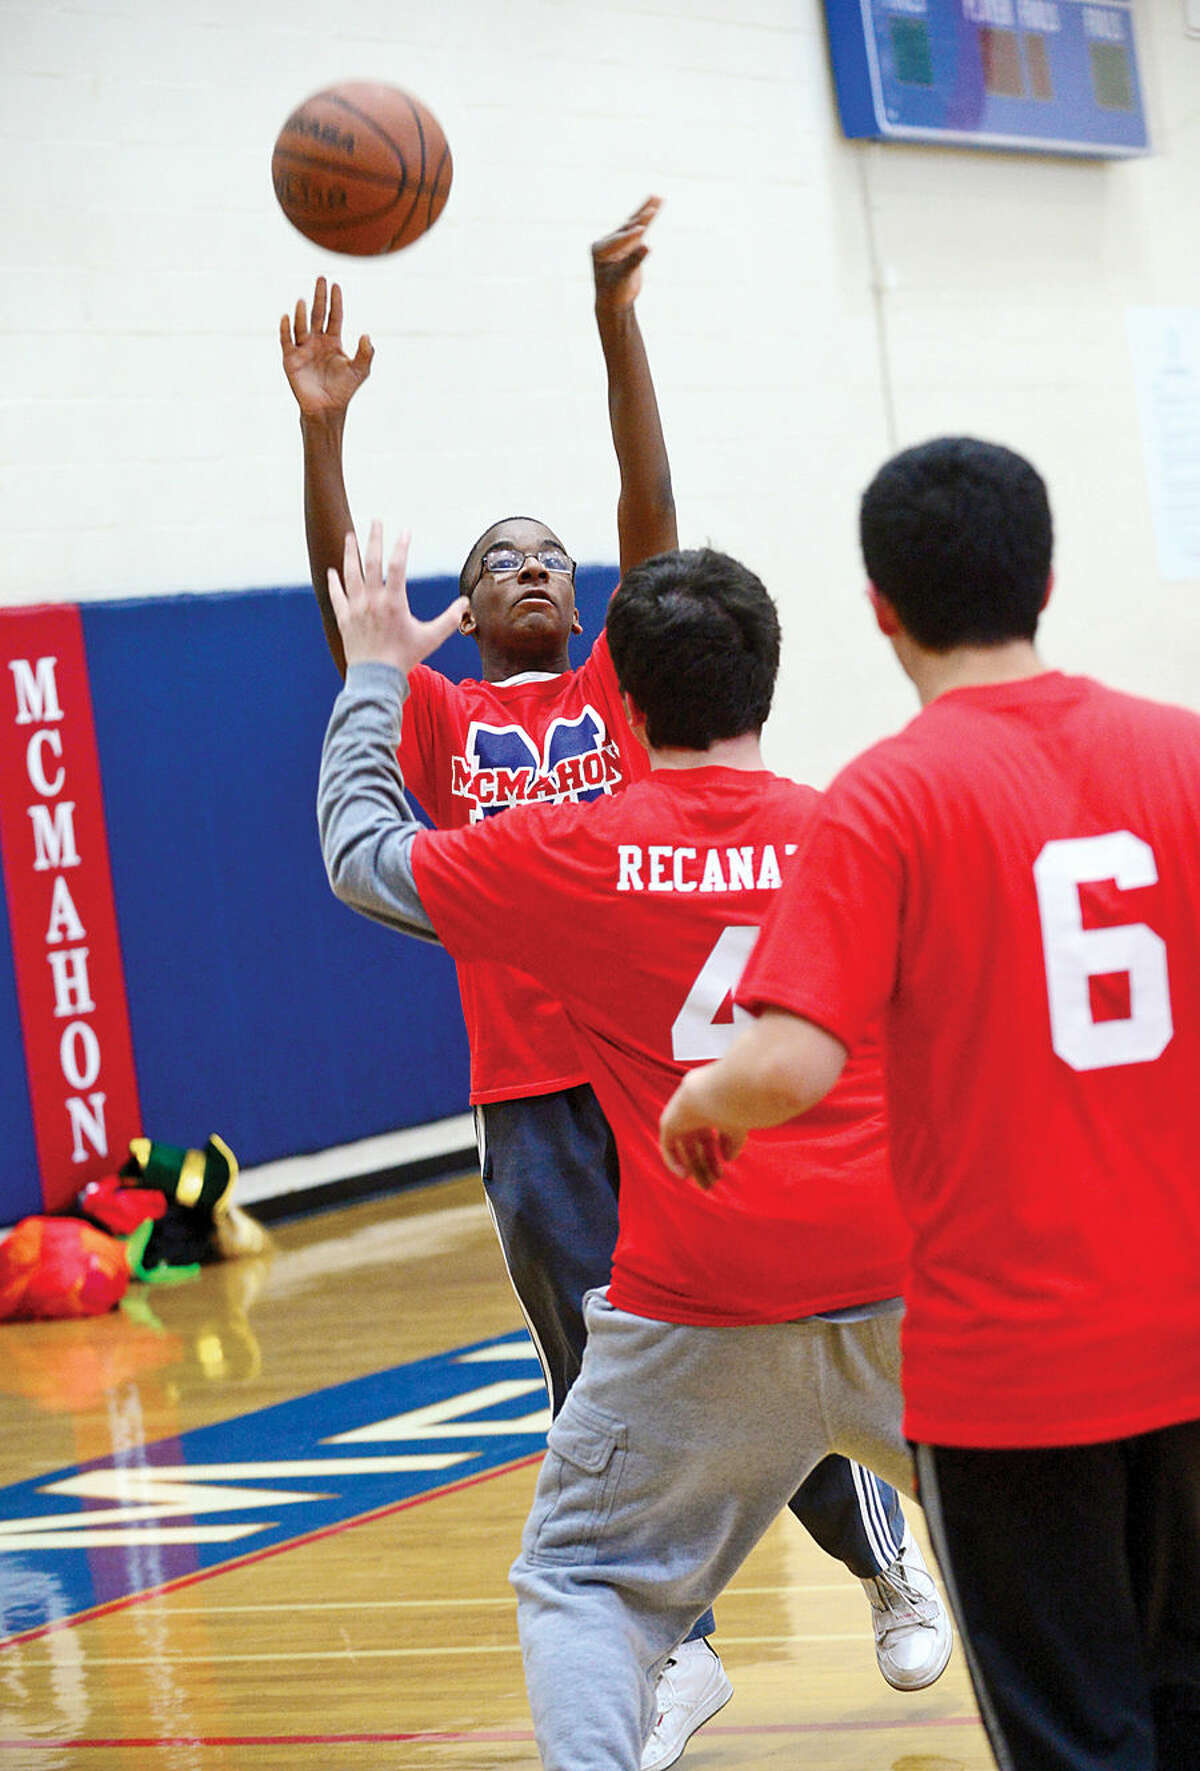 Hour photo / Erik Trautmann Ralph Laguerre shoots during Brien McMahon High School's new Unified Sports Team basketball prcatice Tuesday.